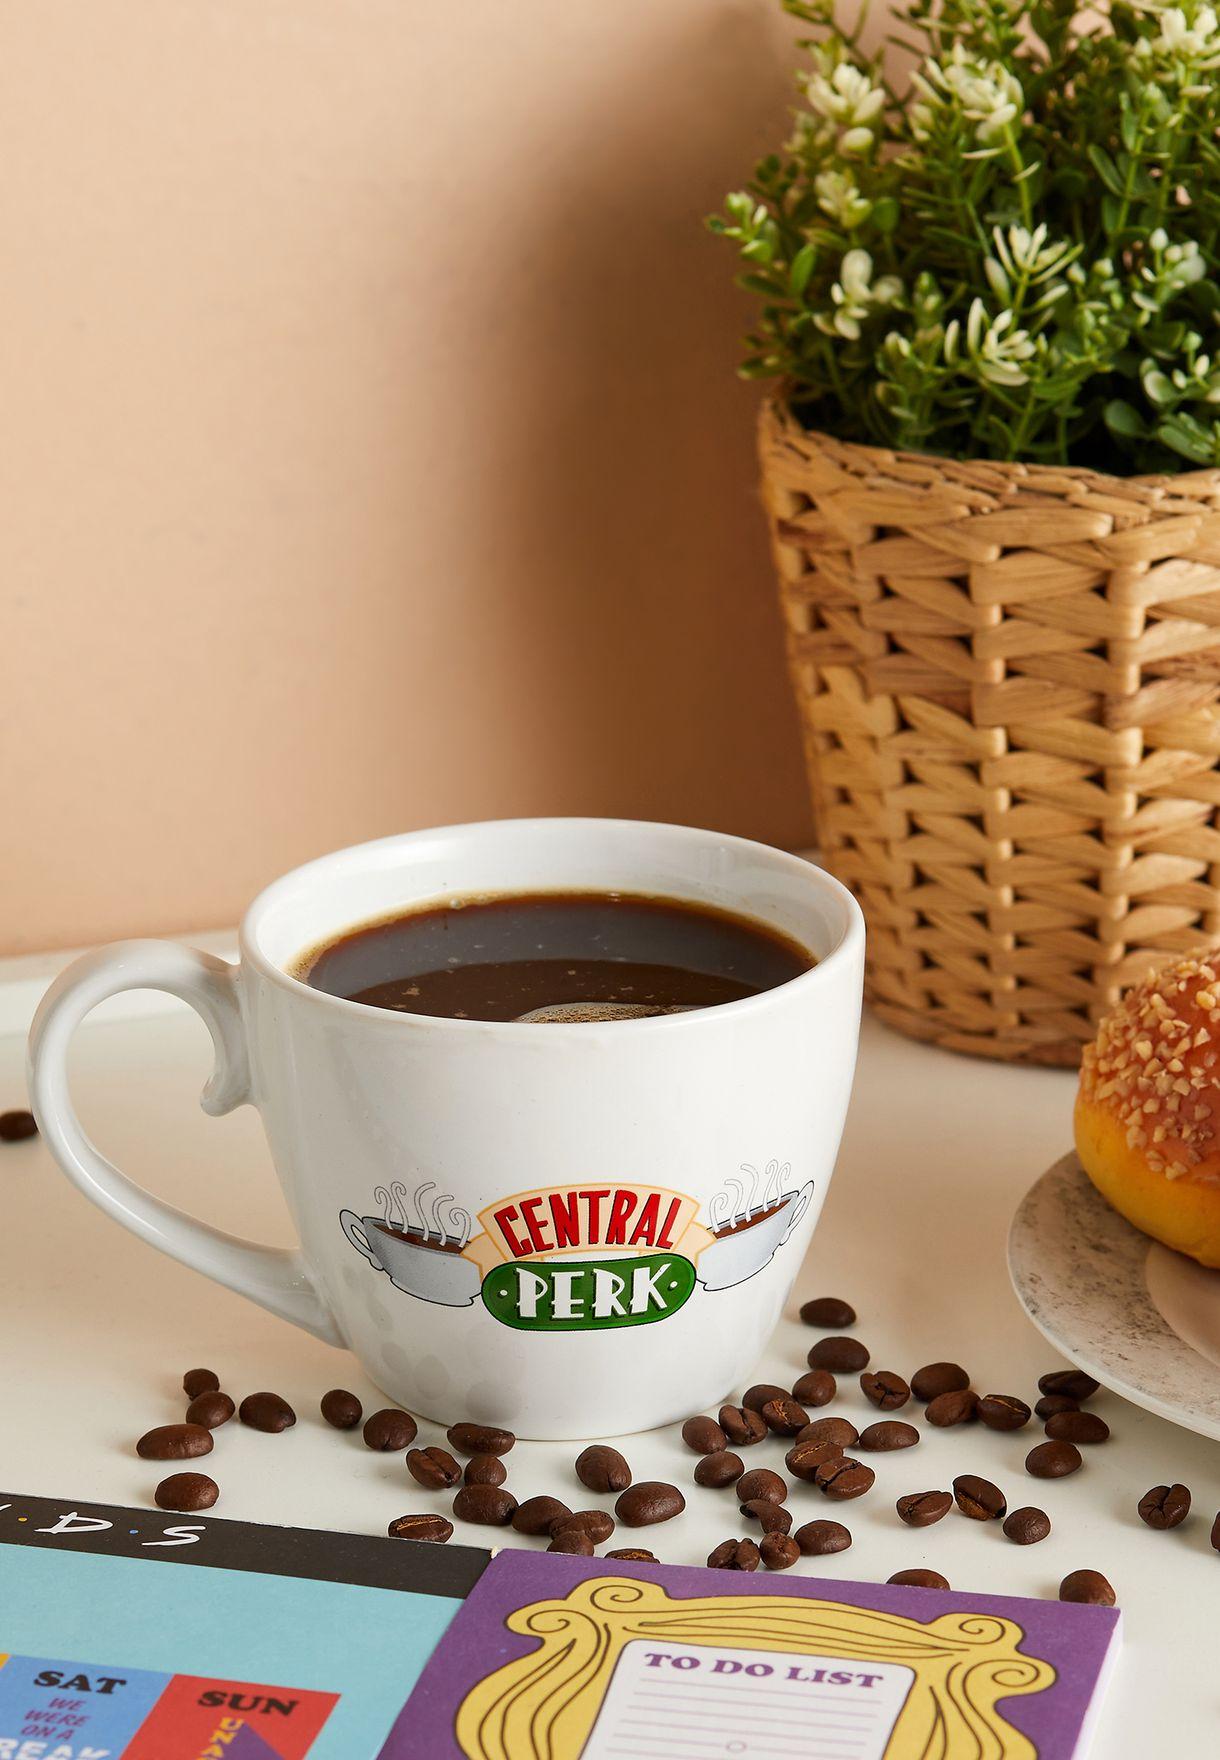 Friends Central Perk Coffee Mug